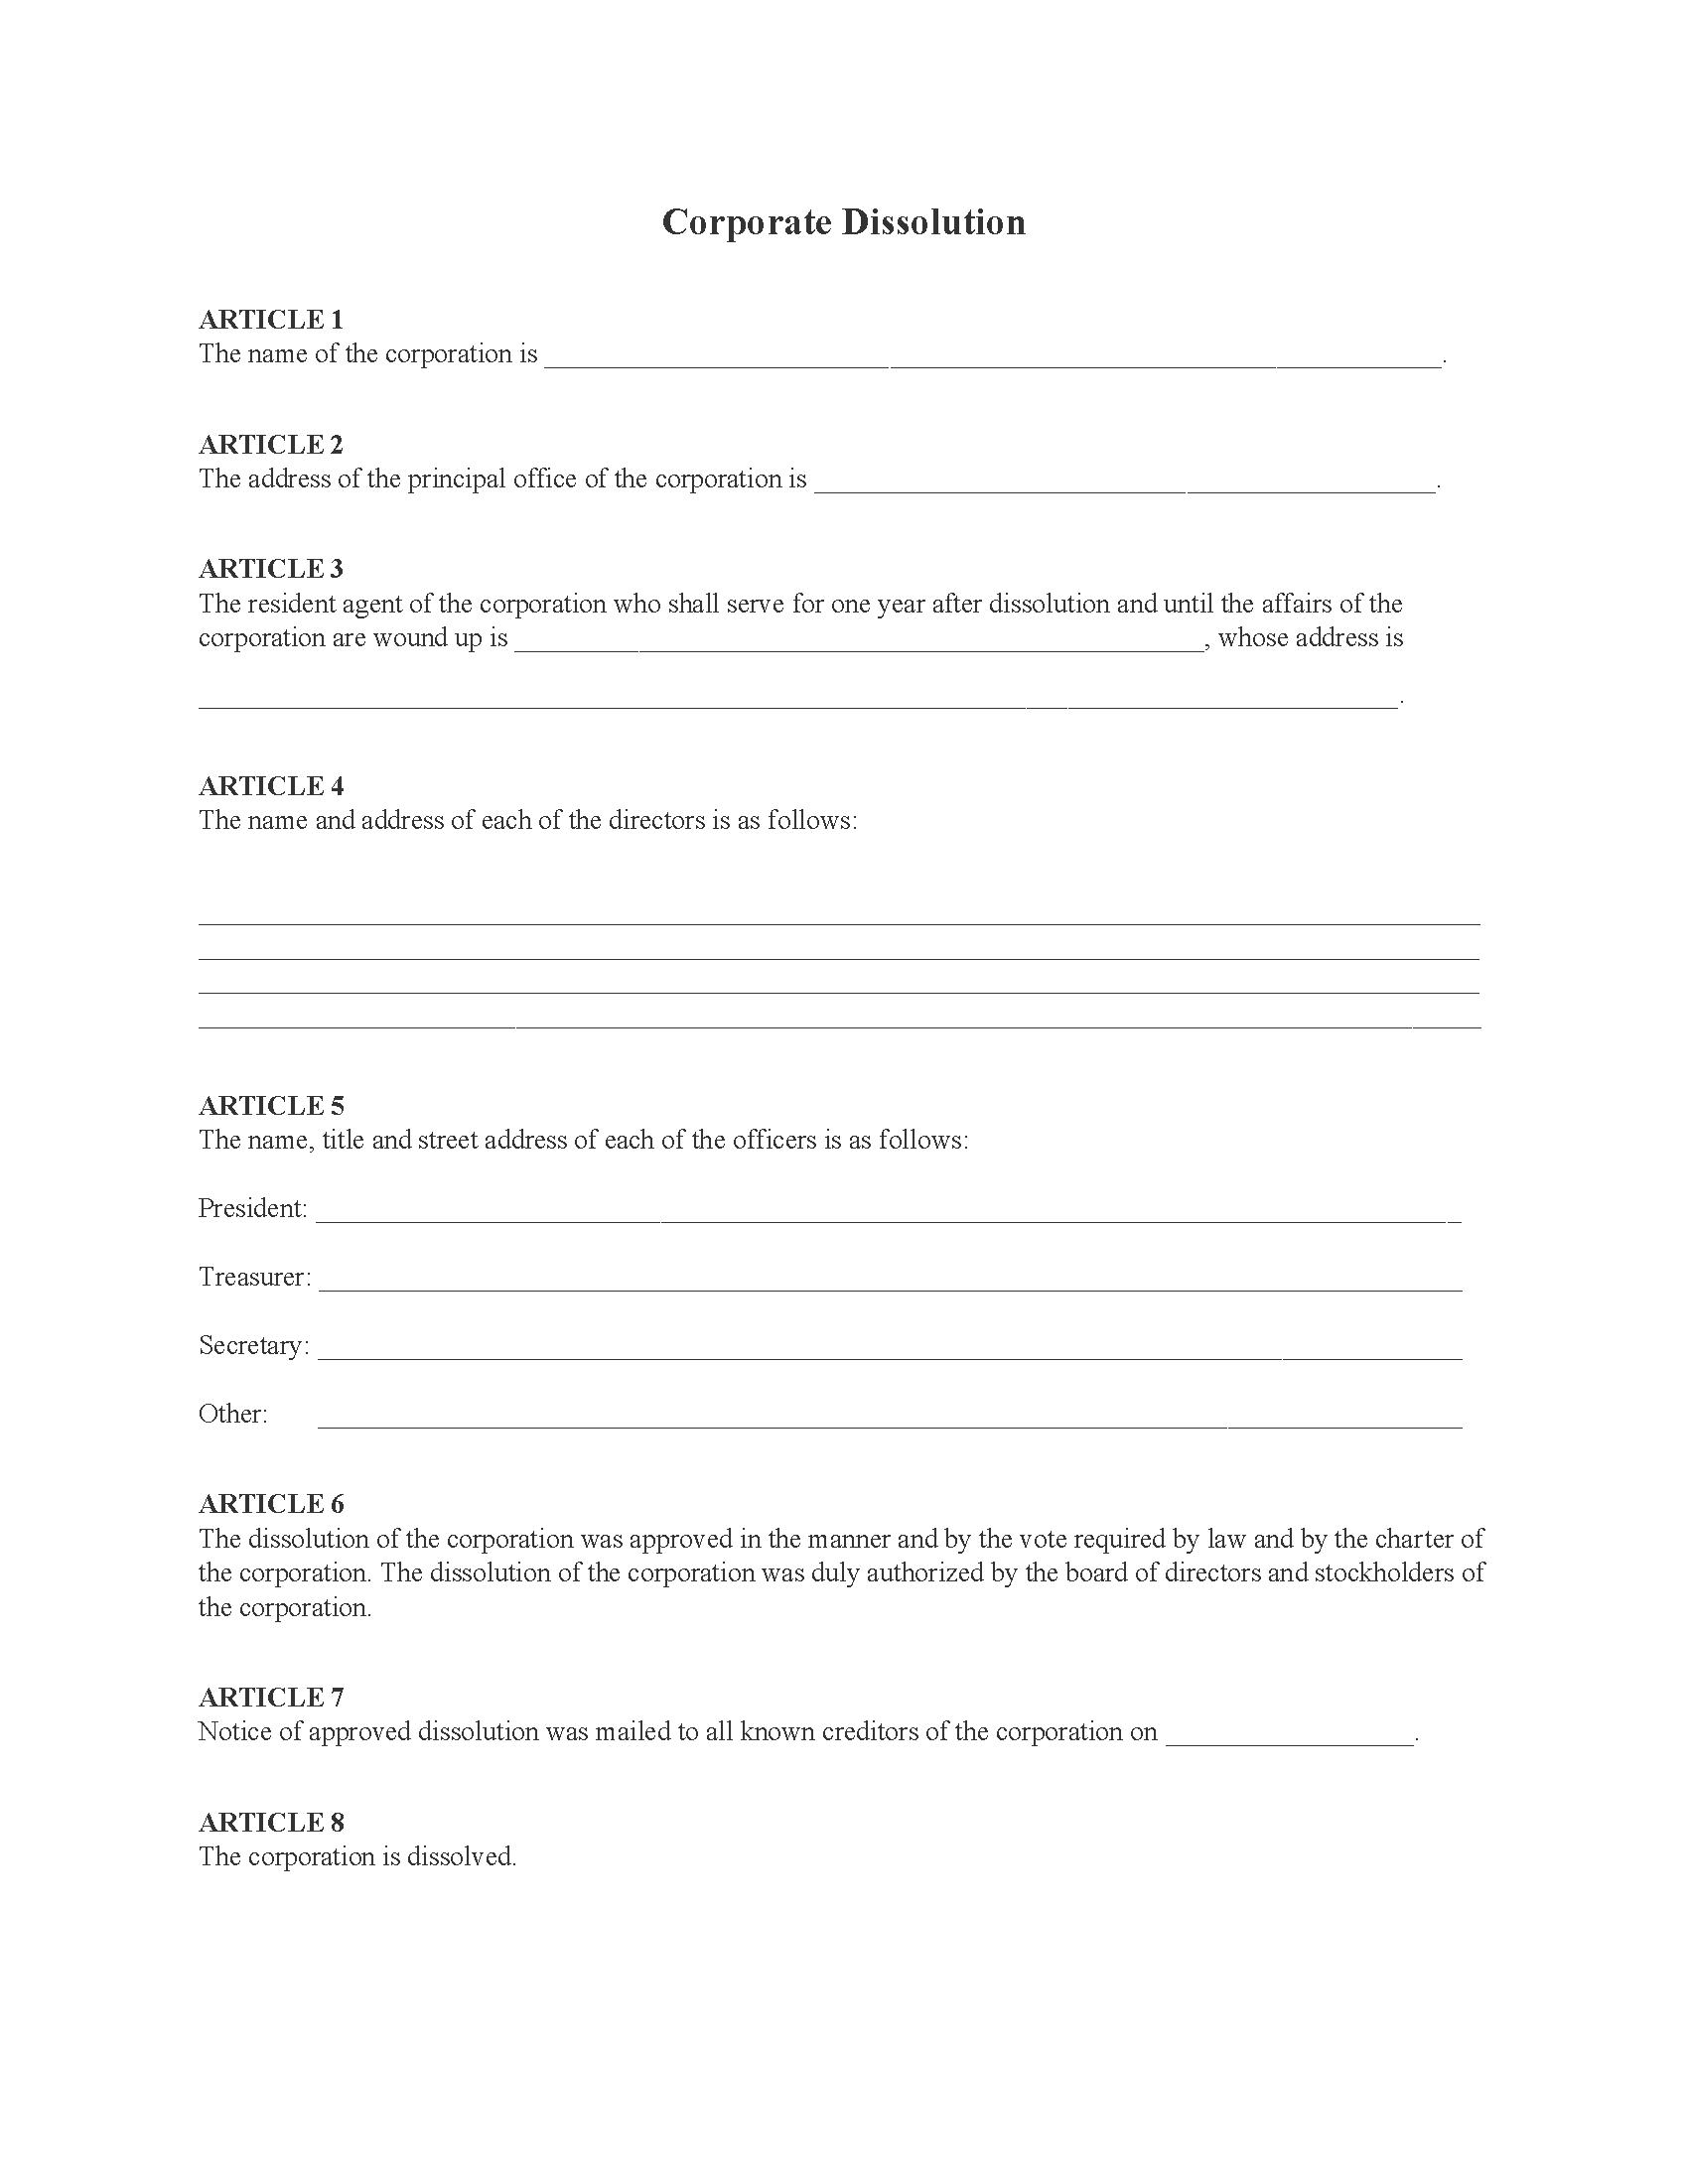 Dissolution of Corporation Notice